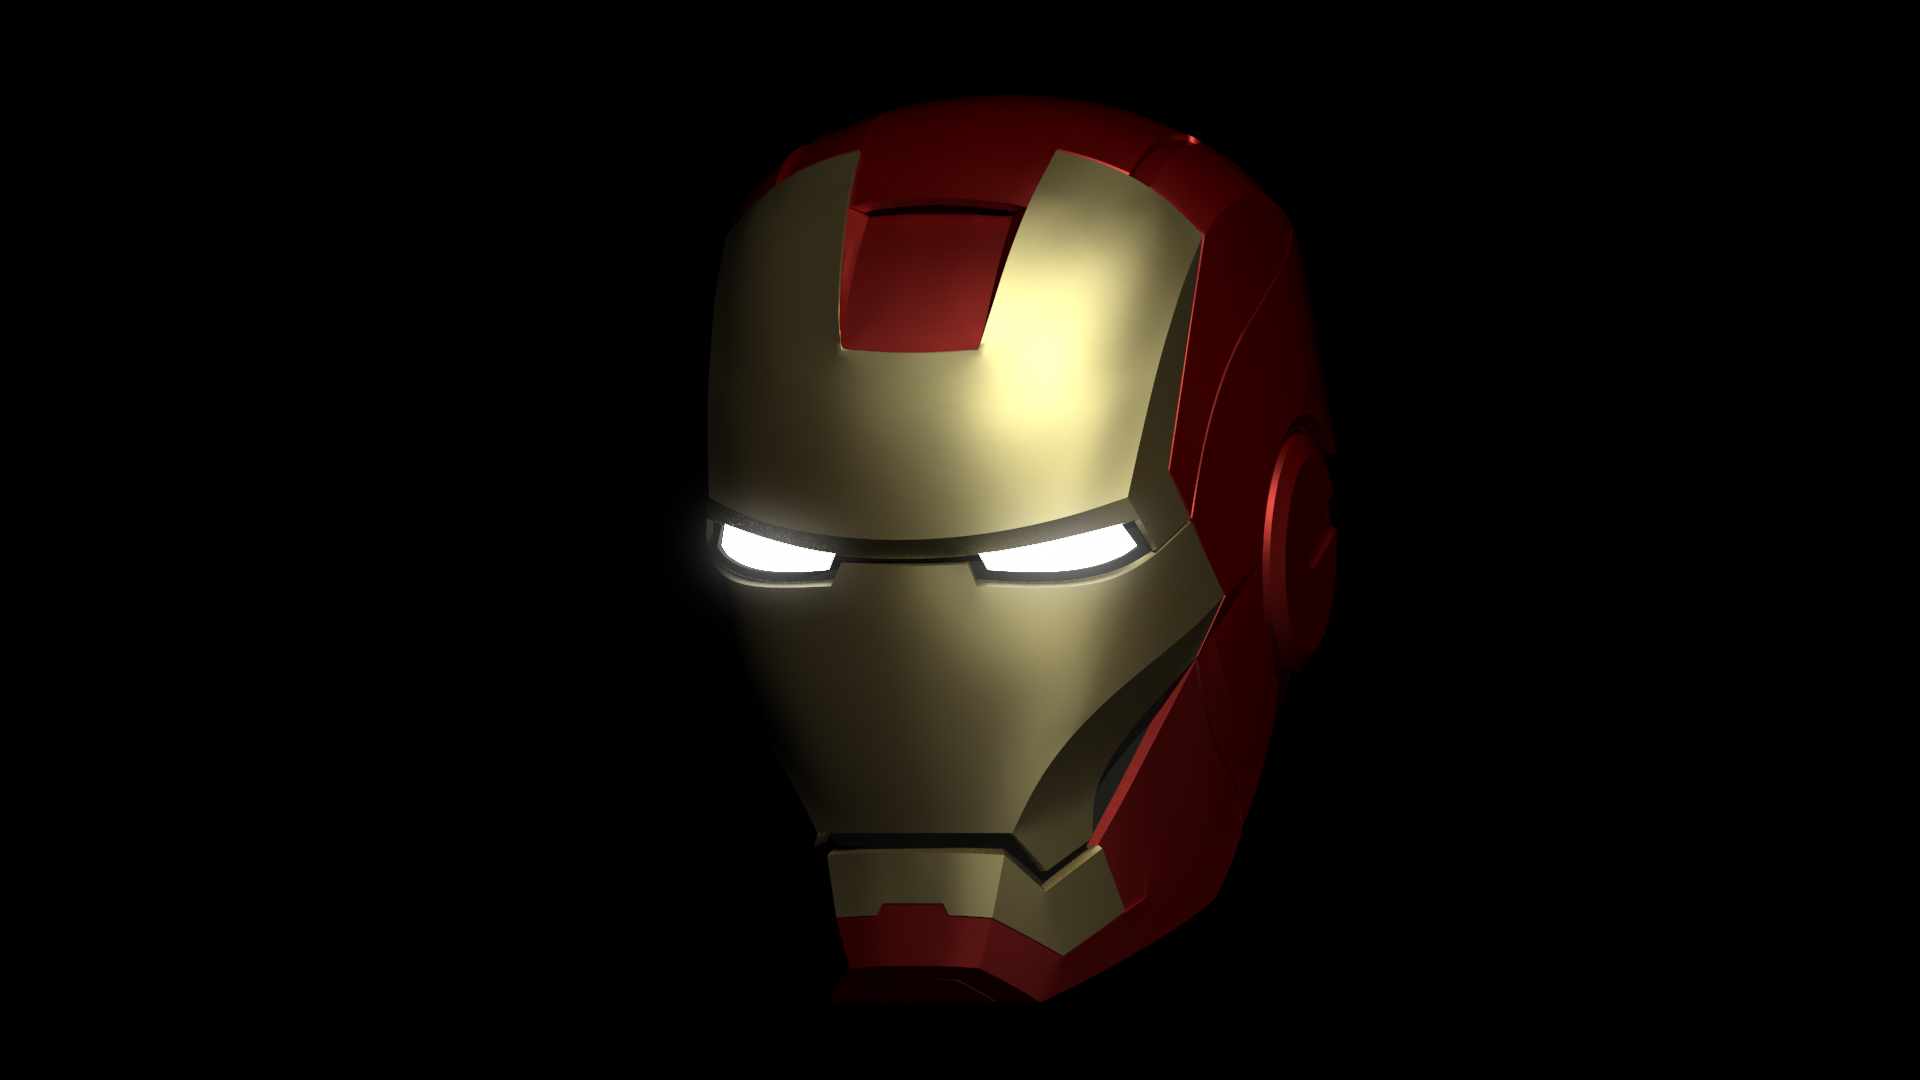 mark vi ironman helmet renderjtm1997 on deviantart